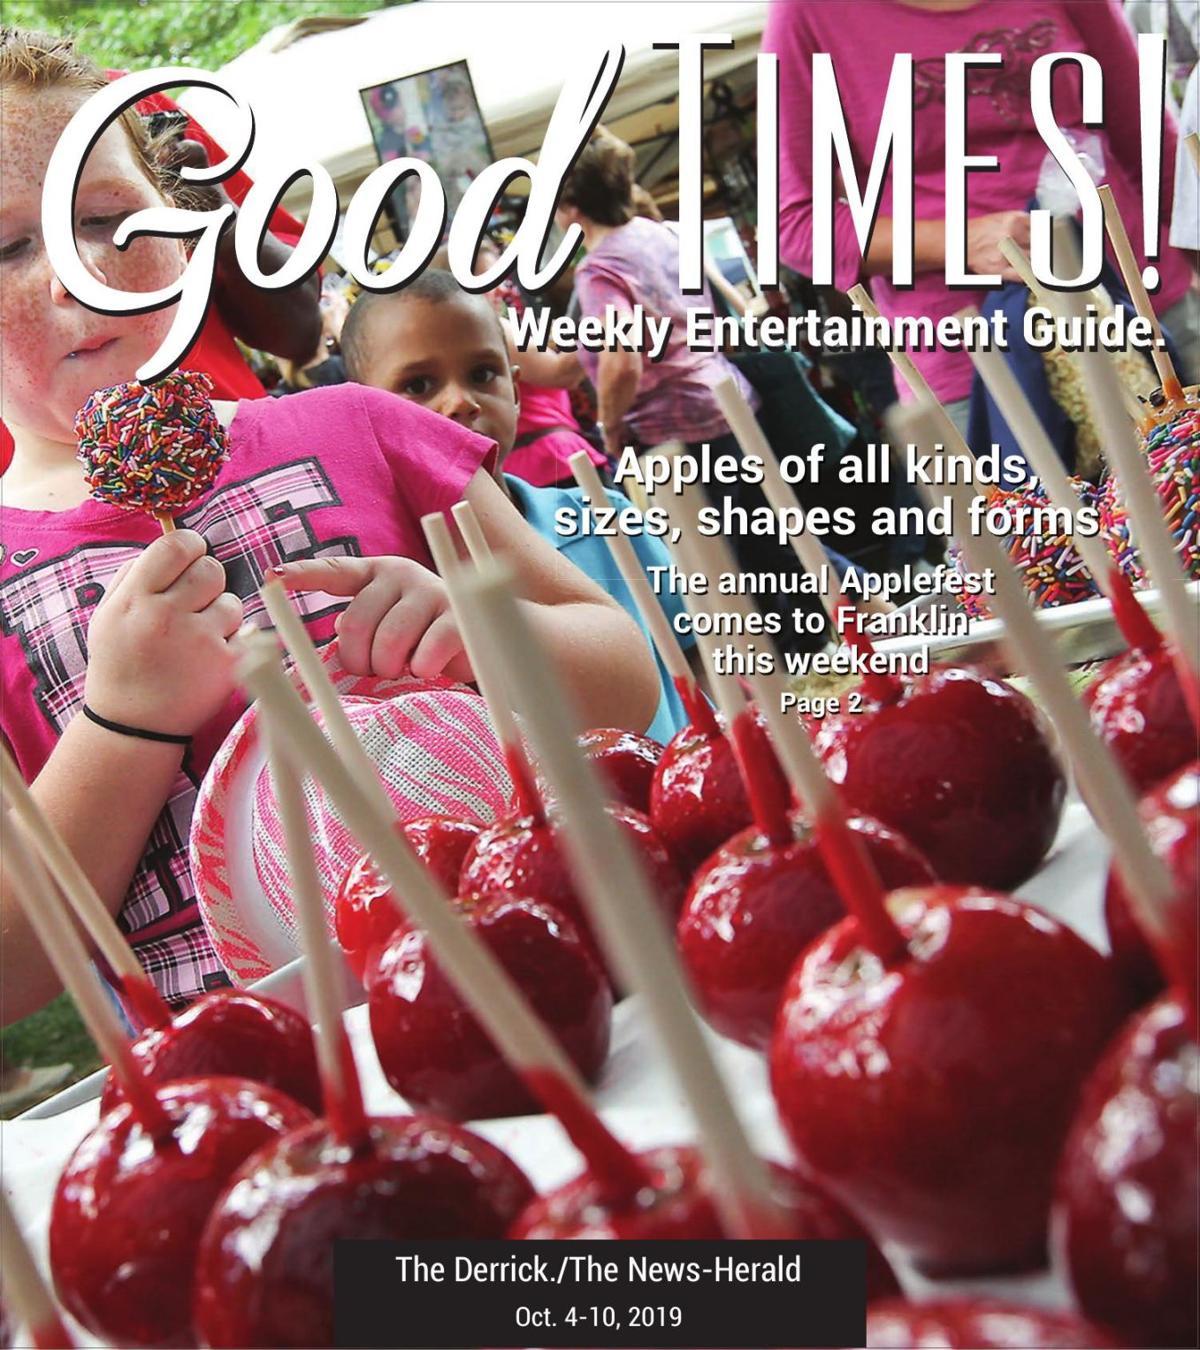 Good Times 10-04-19